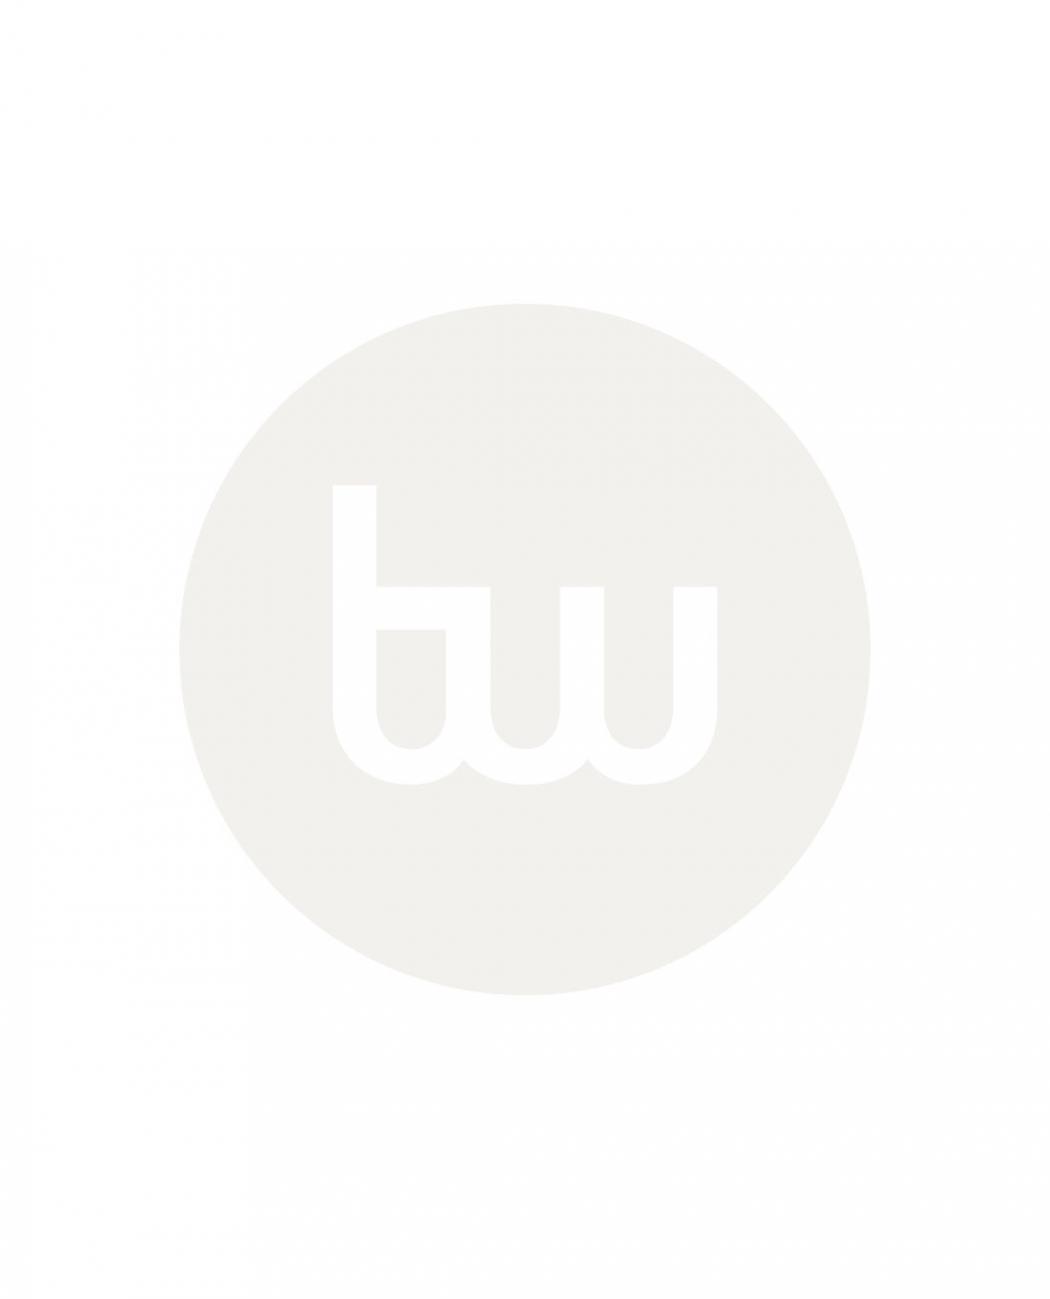 online store 05bcc 892f3 Salomon XA Pro 3D MID Forces Burro - TACWRK